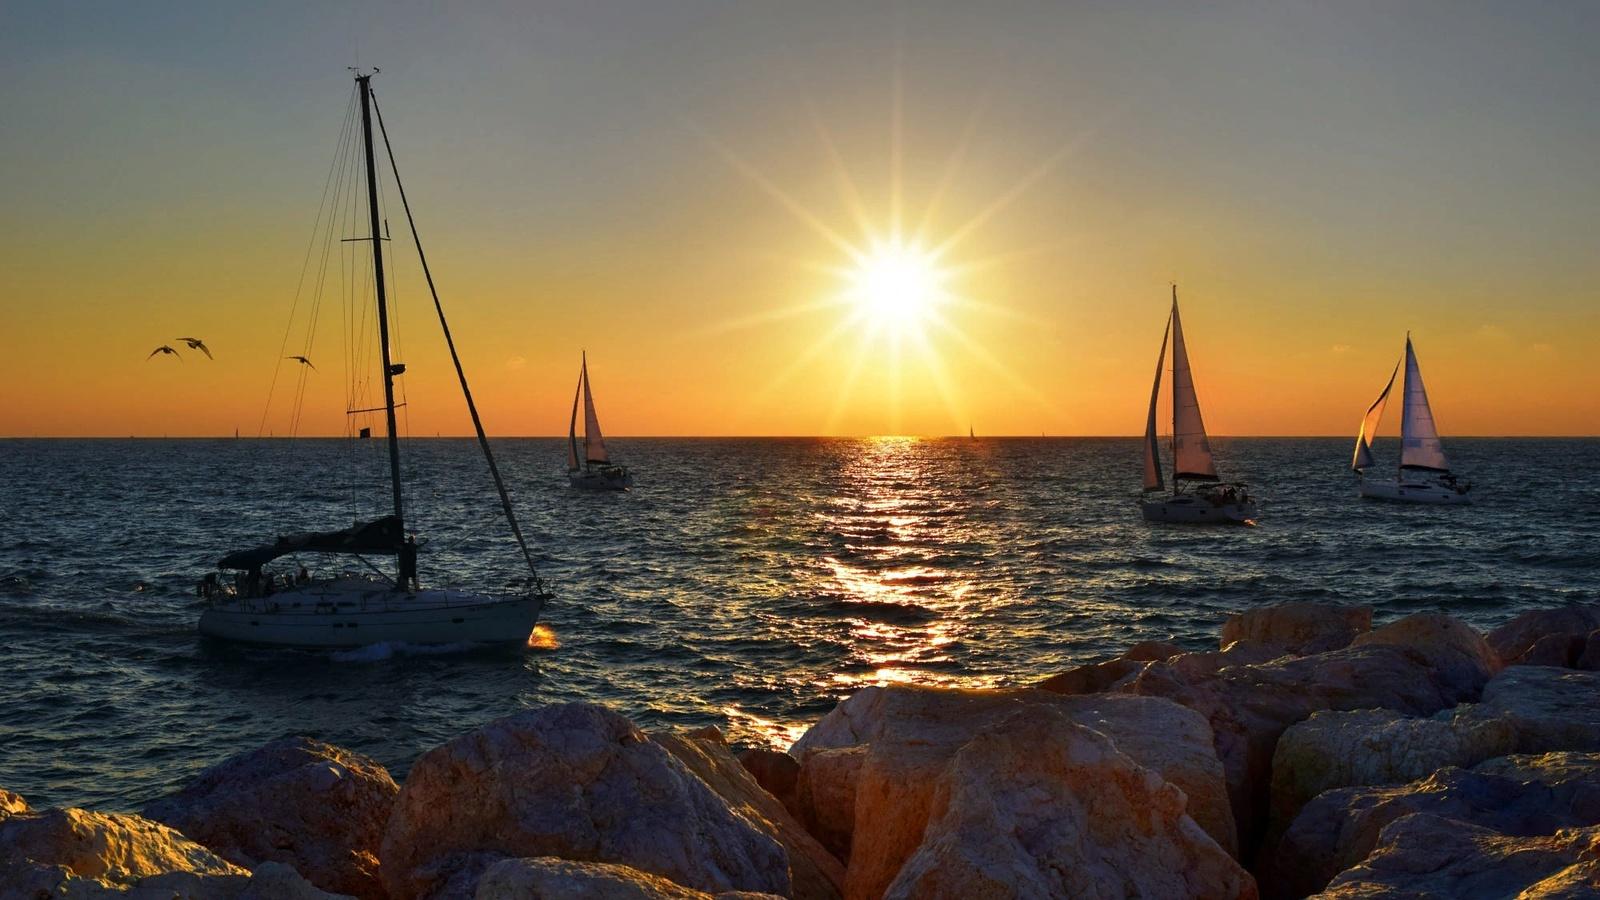 море, пейзаж, закат, природа, лодки, парусники